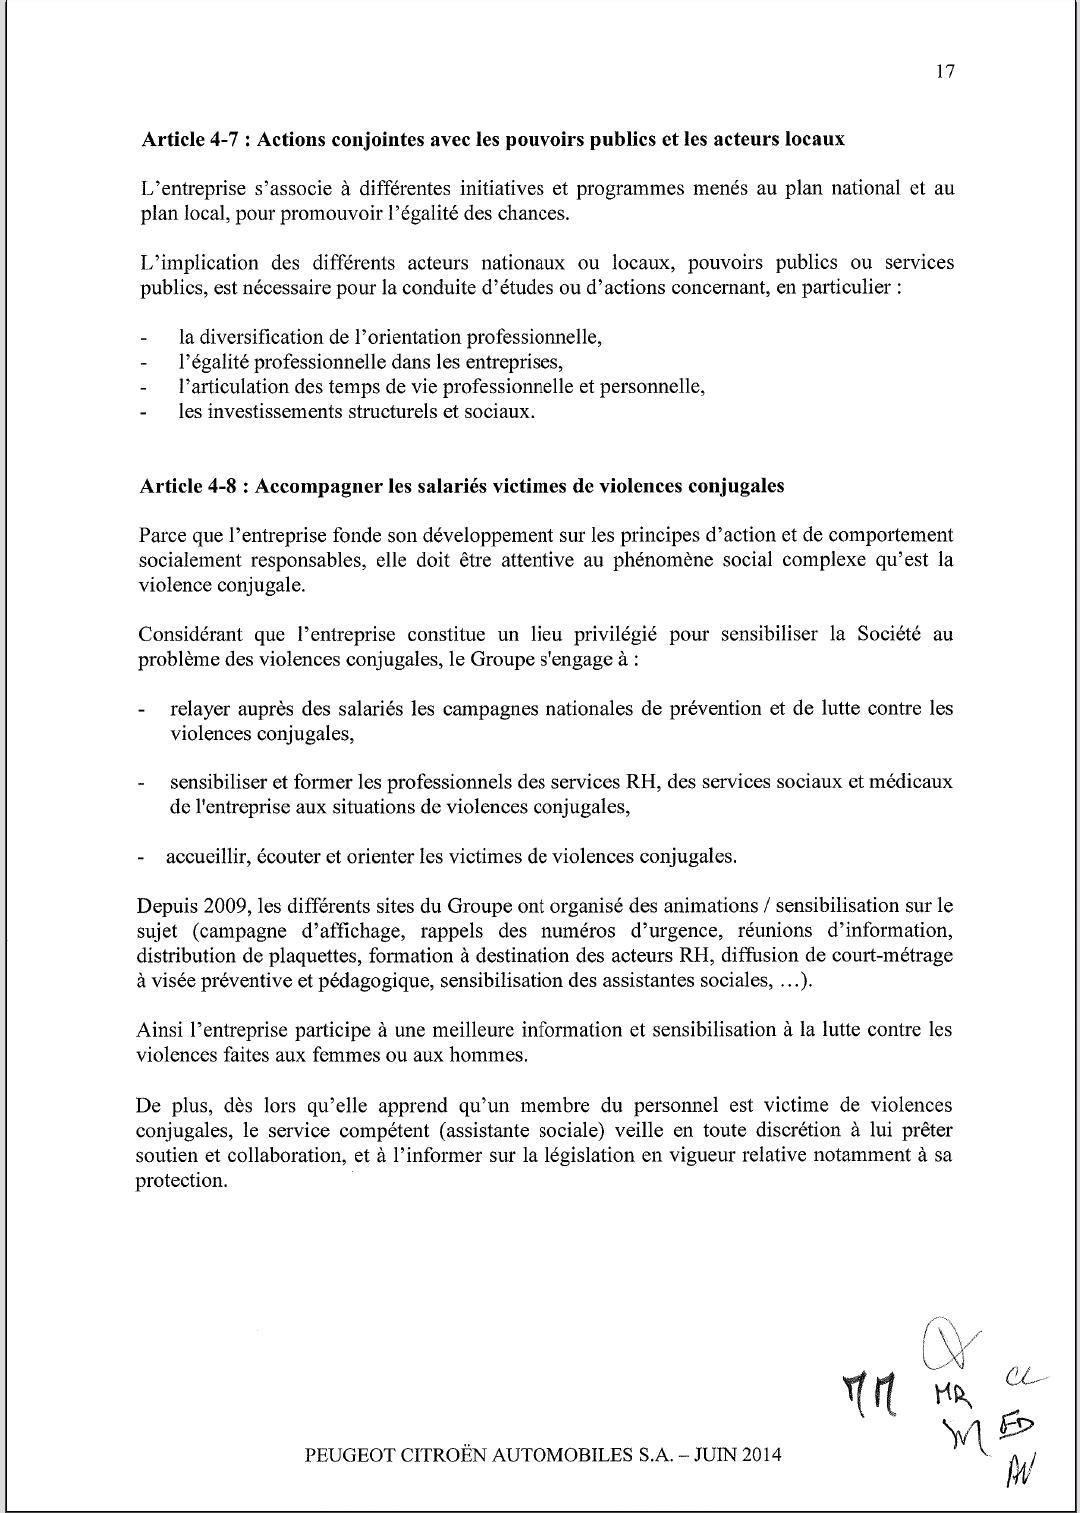 Accord17